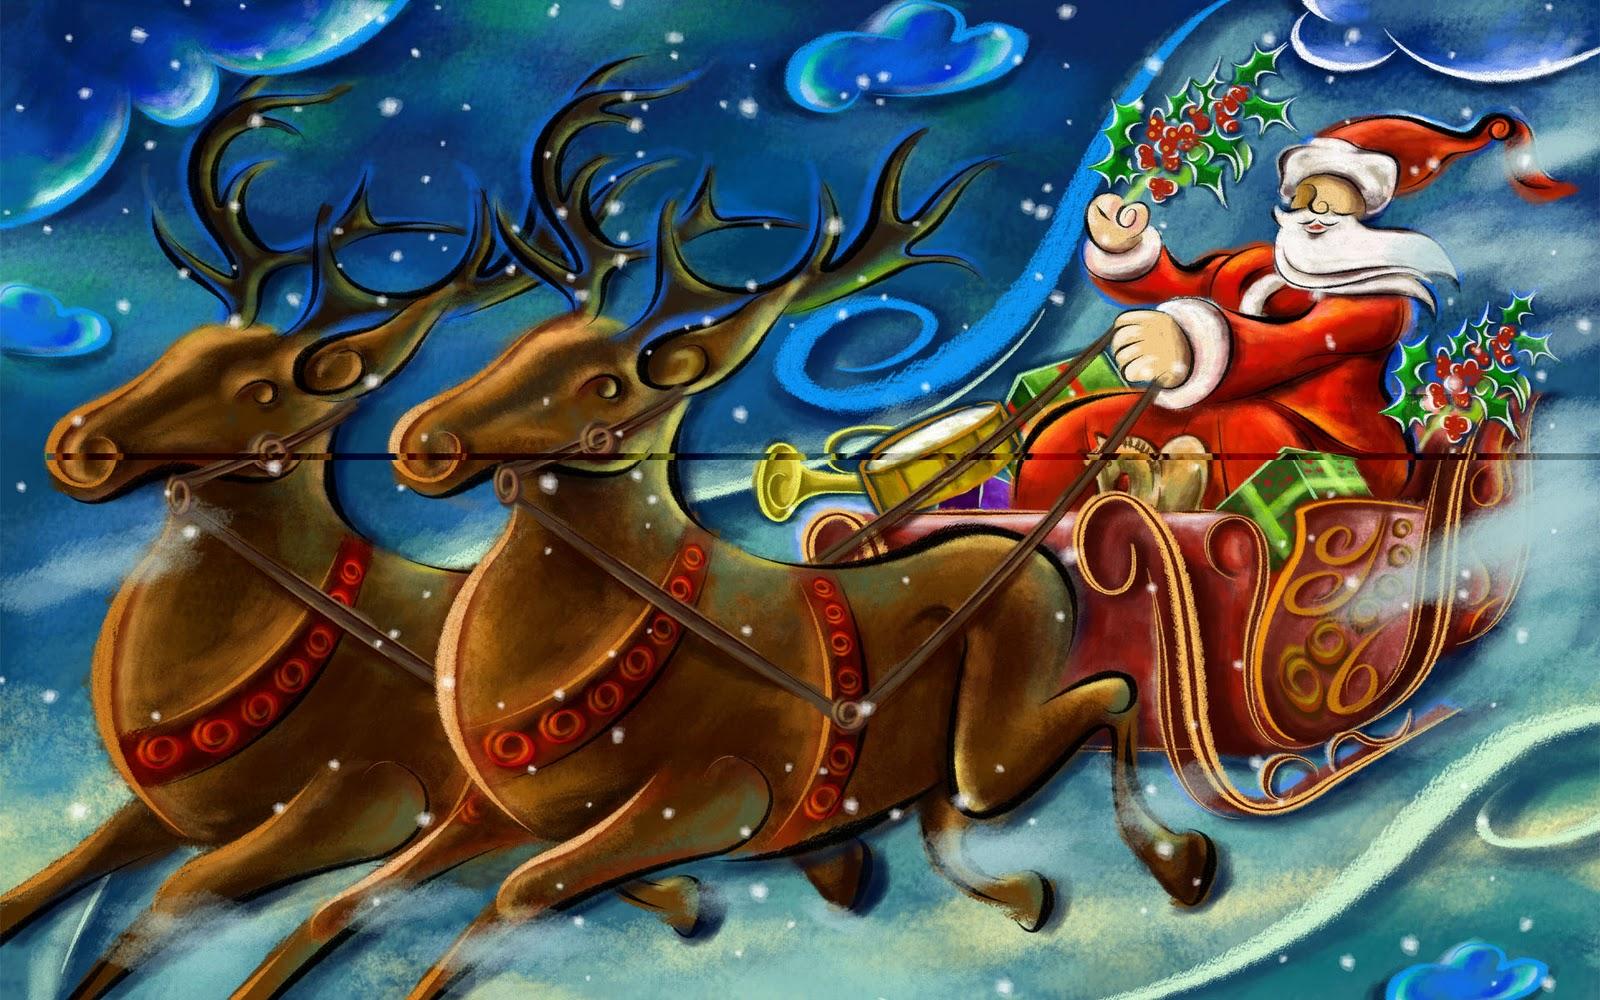 https://1.bp.blogspot.com/-sckTCAua4cE/TugpRr-_nII/AAAAAAAAAhc/bmAMnyXA3tE/s1600/santa_clause_creative_art_work-wide.jpg